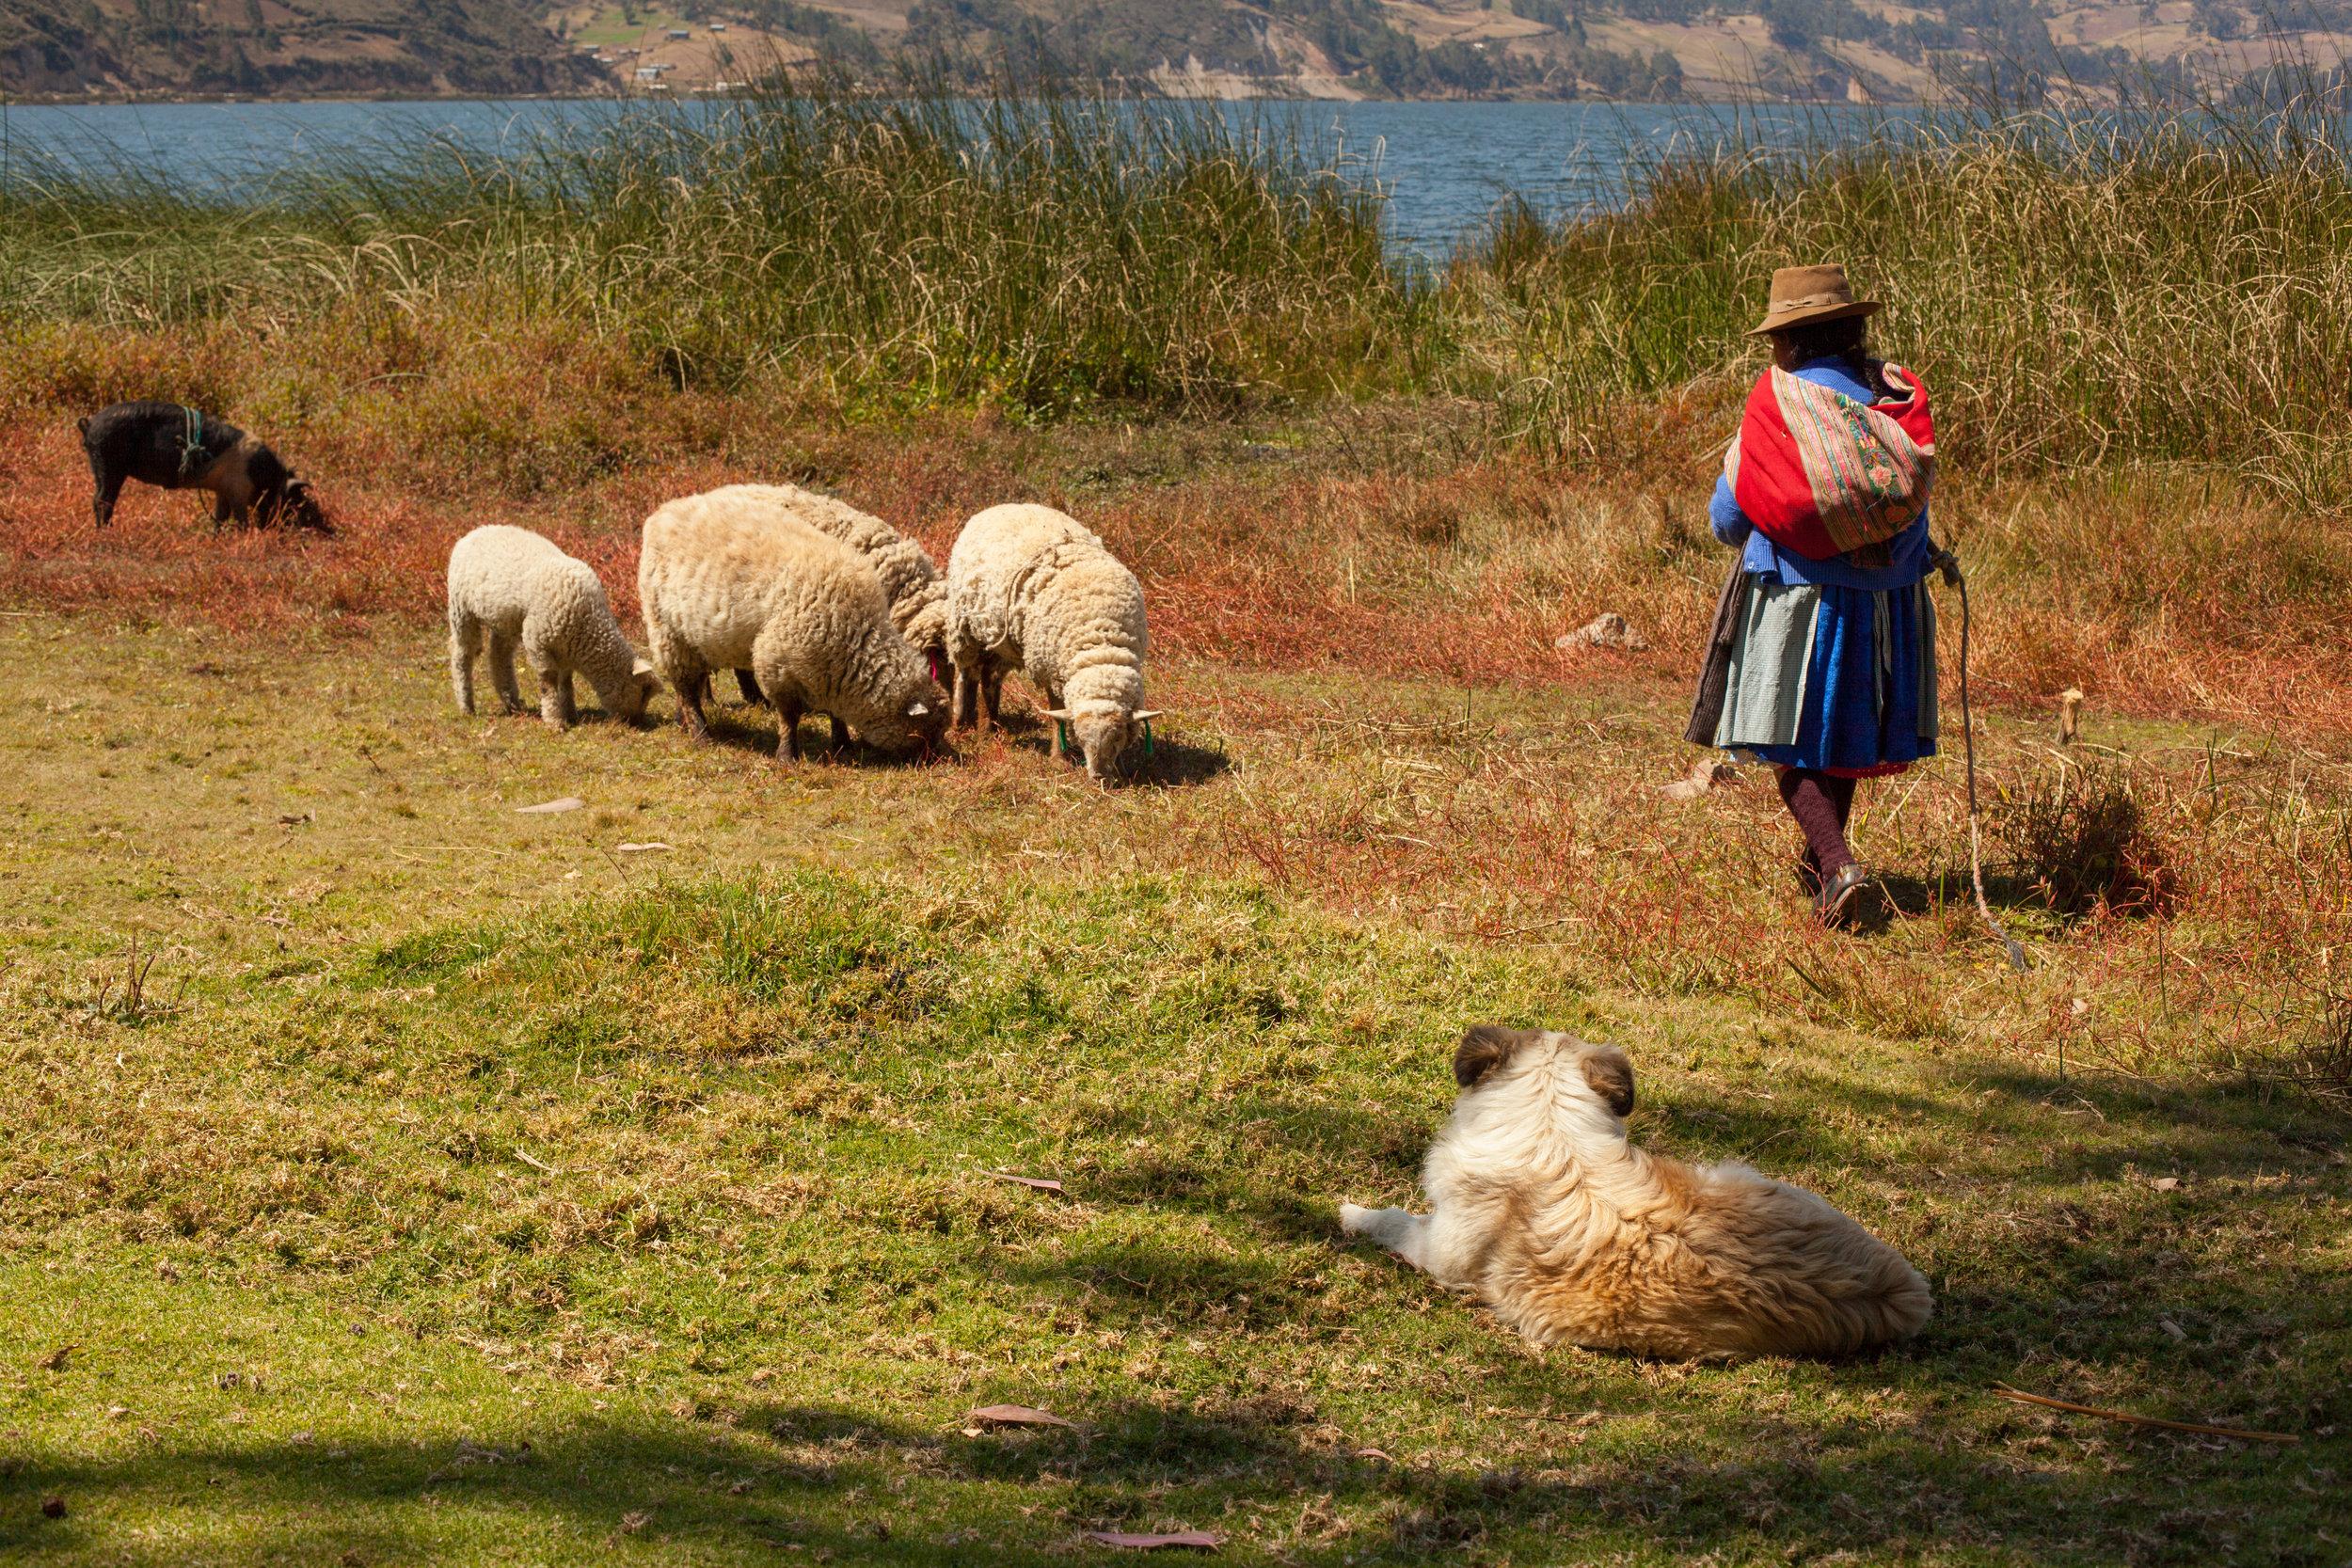 The shores of Lake Pachuca, Andahuaylas in Peru.